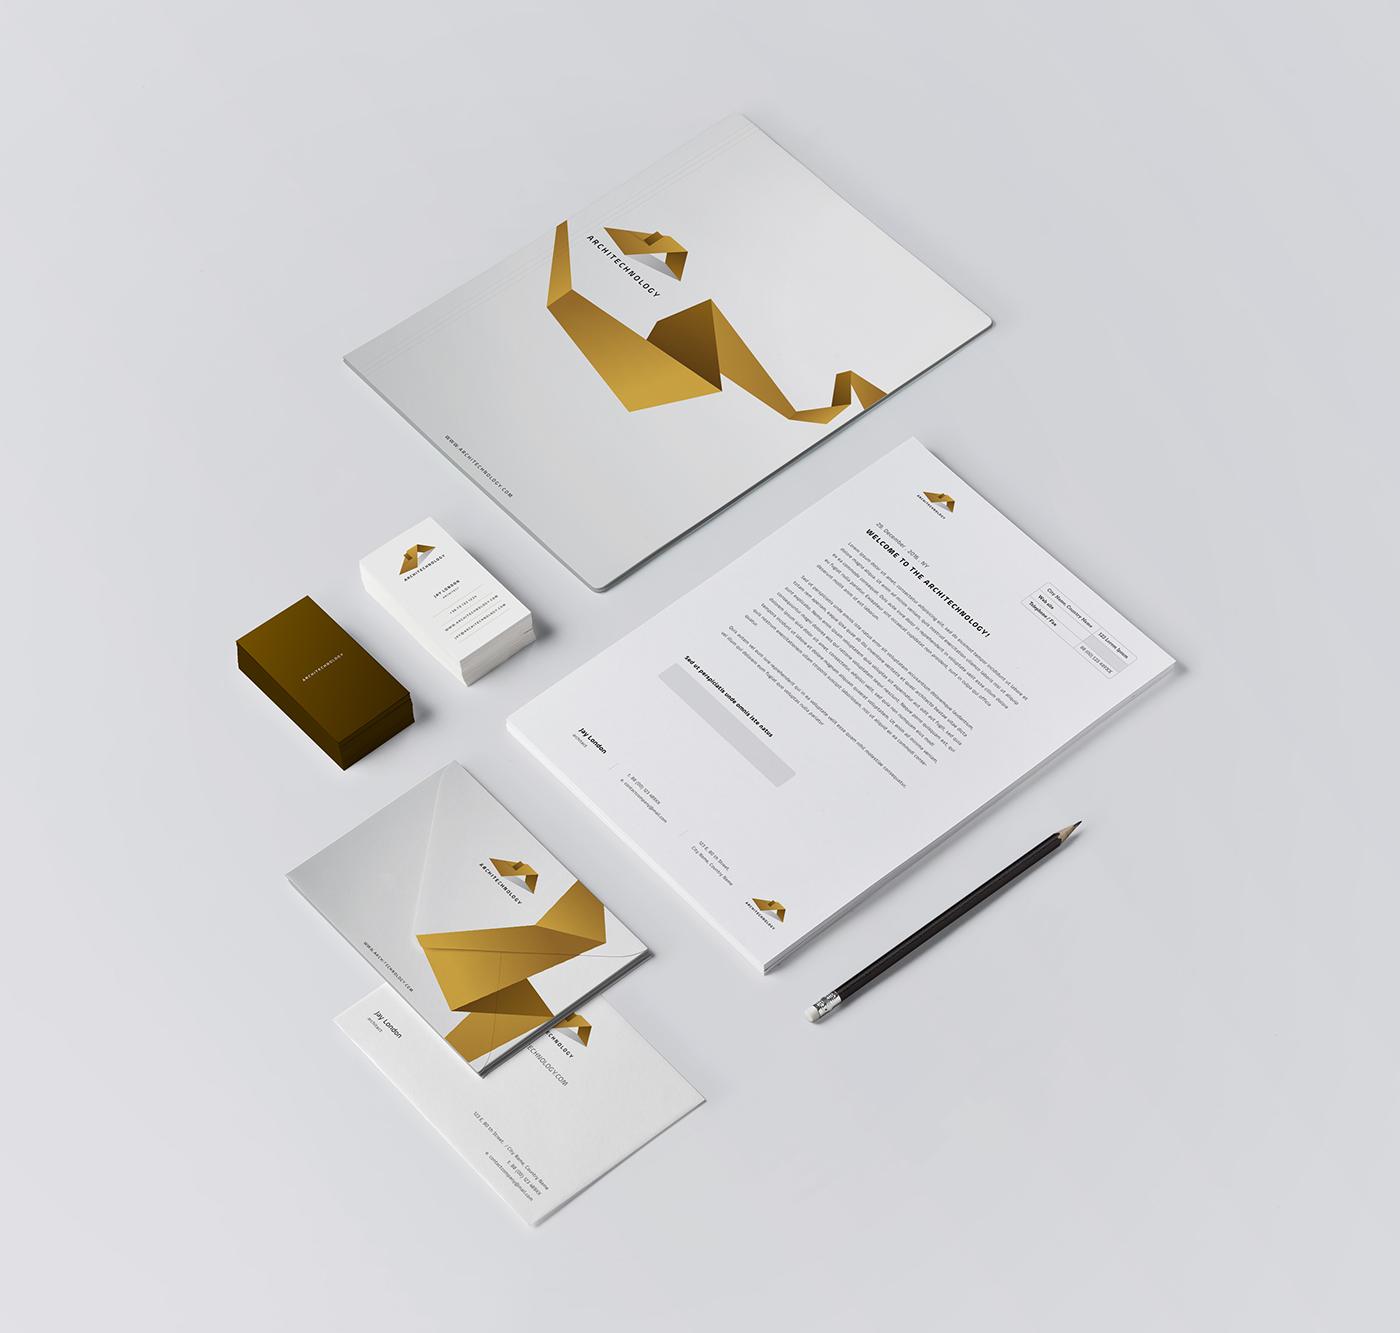 architect vector minimal logo branding  identity architecture constructing